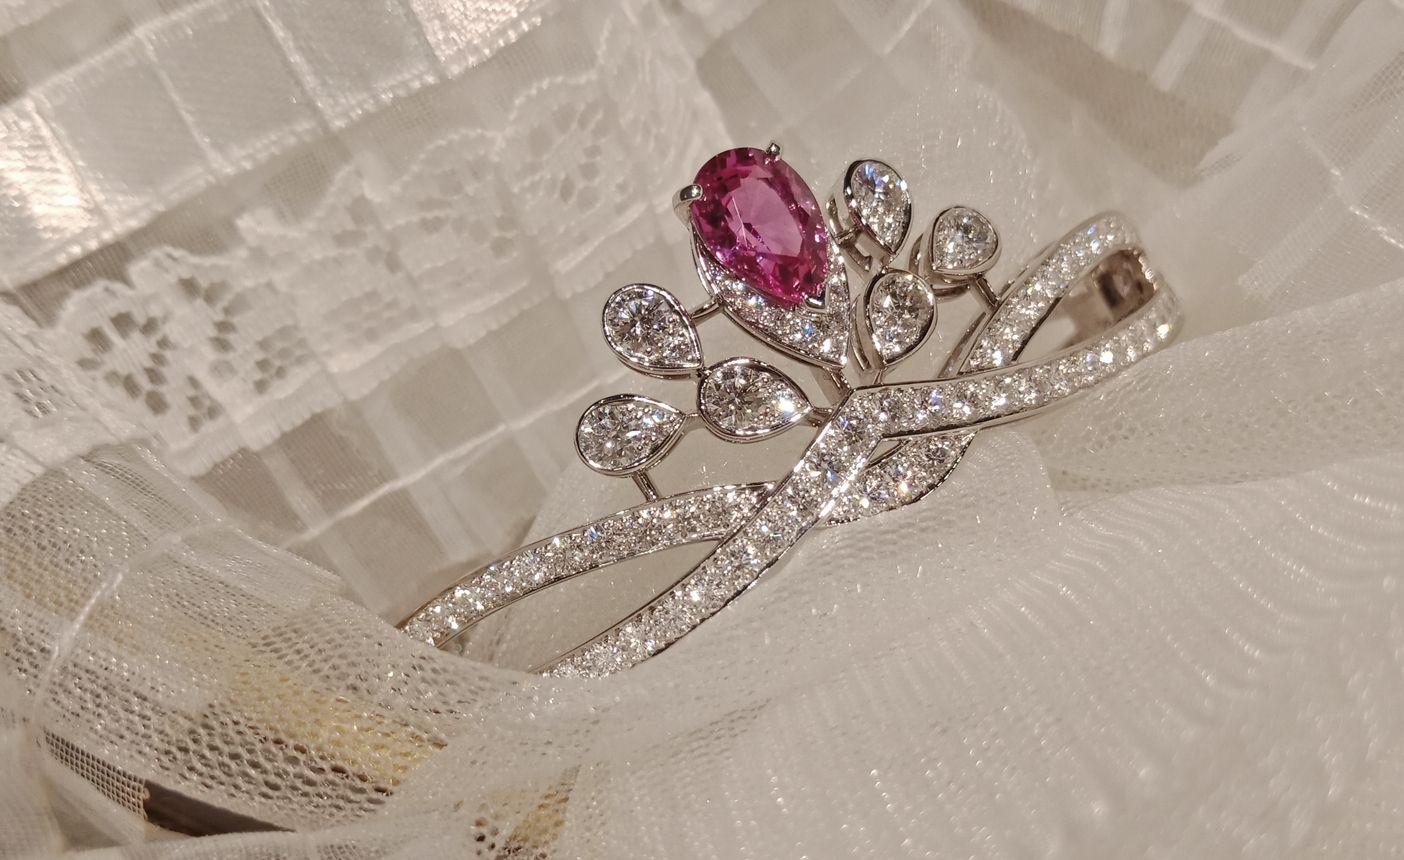 CHAUMET用Joséphine系列珠寶為妳的愛情加冕,妳也能是最美的皇后